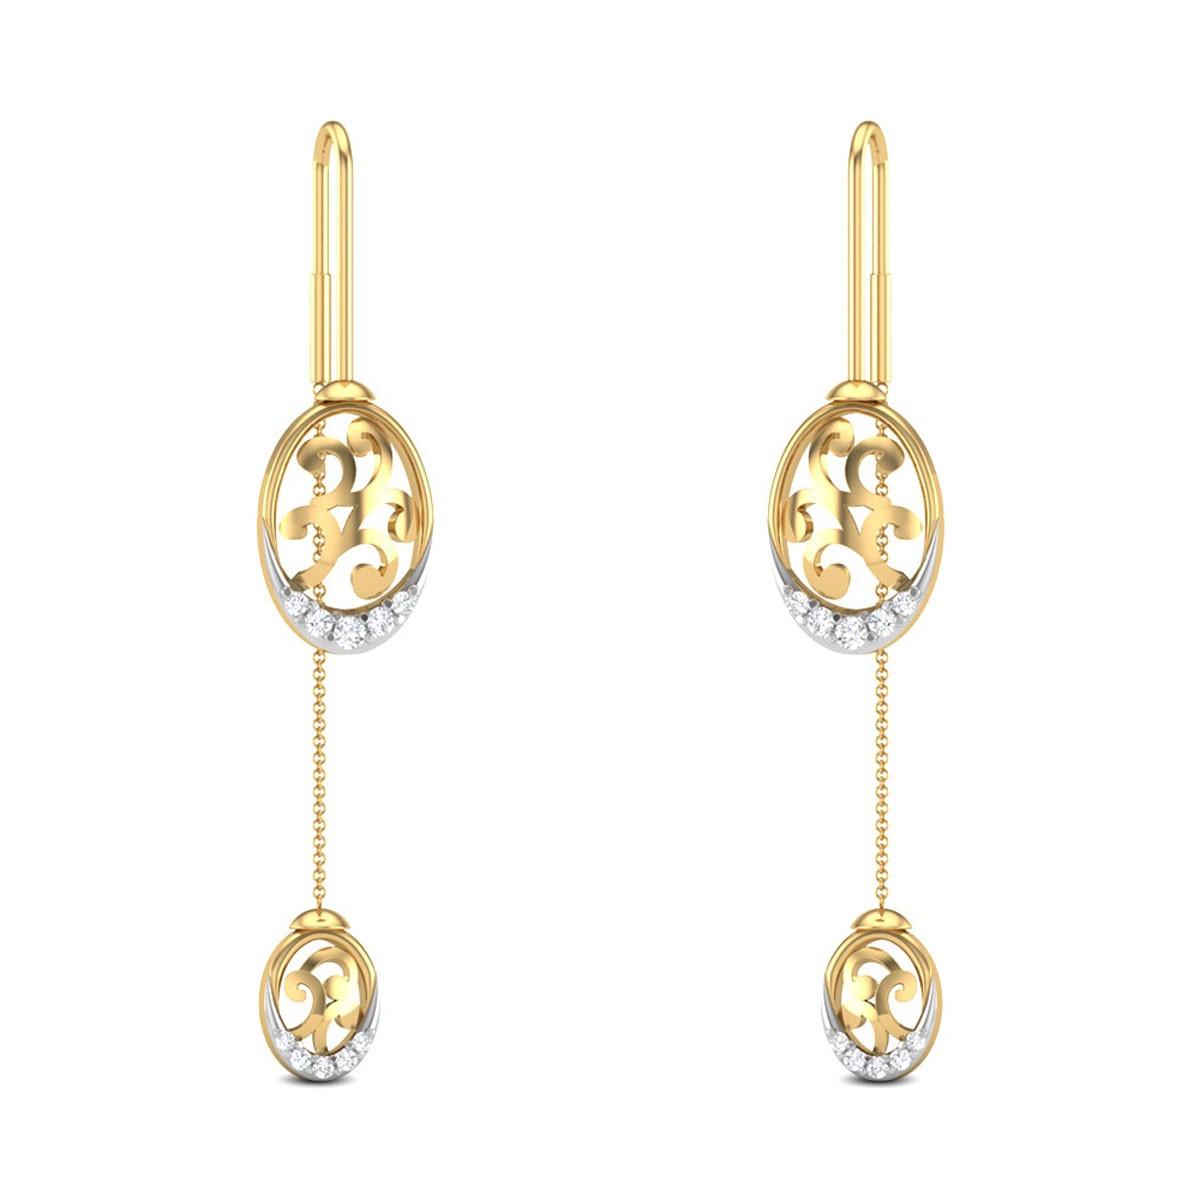 Jaelie Cut Out Sui Dhaga Diamond Earrings